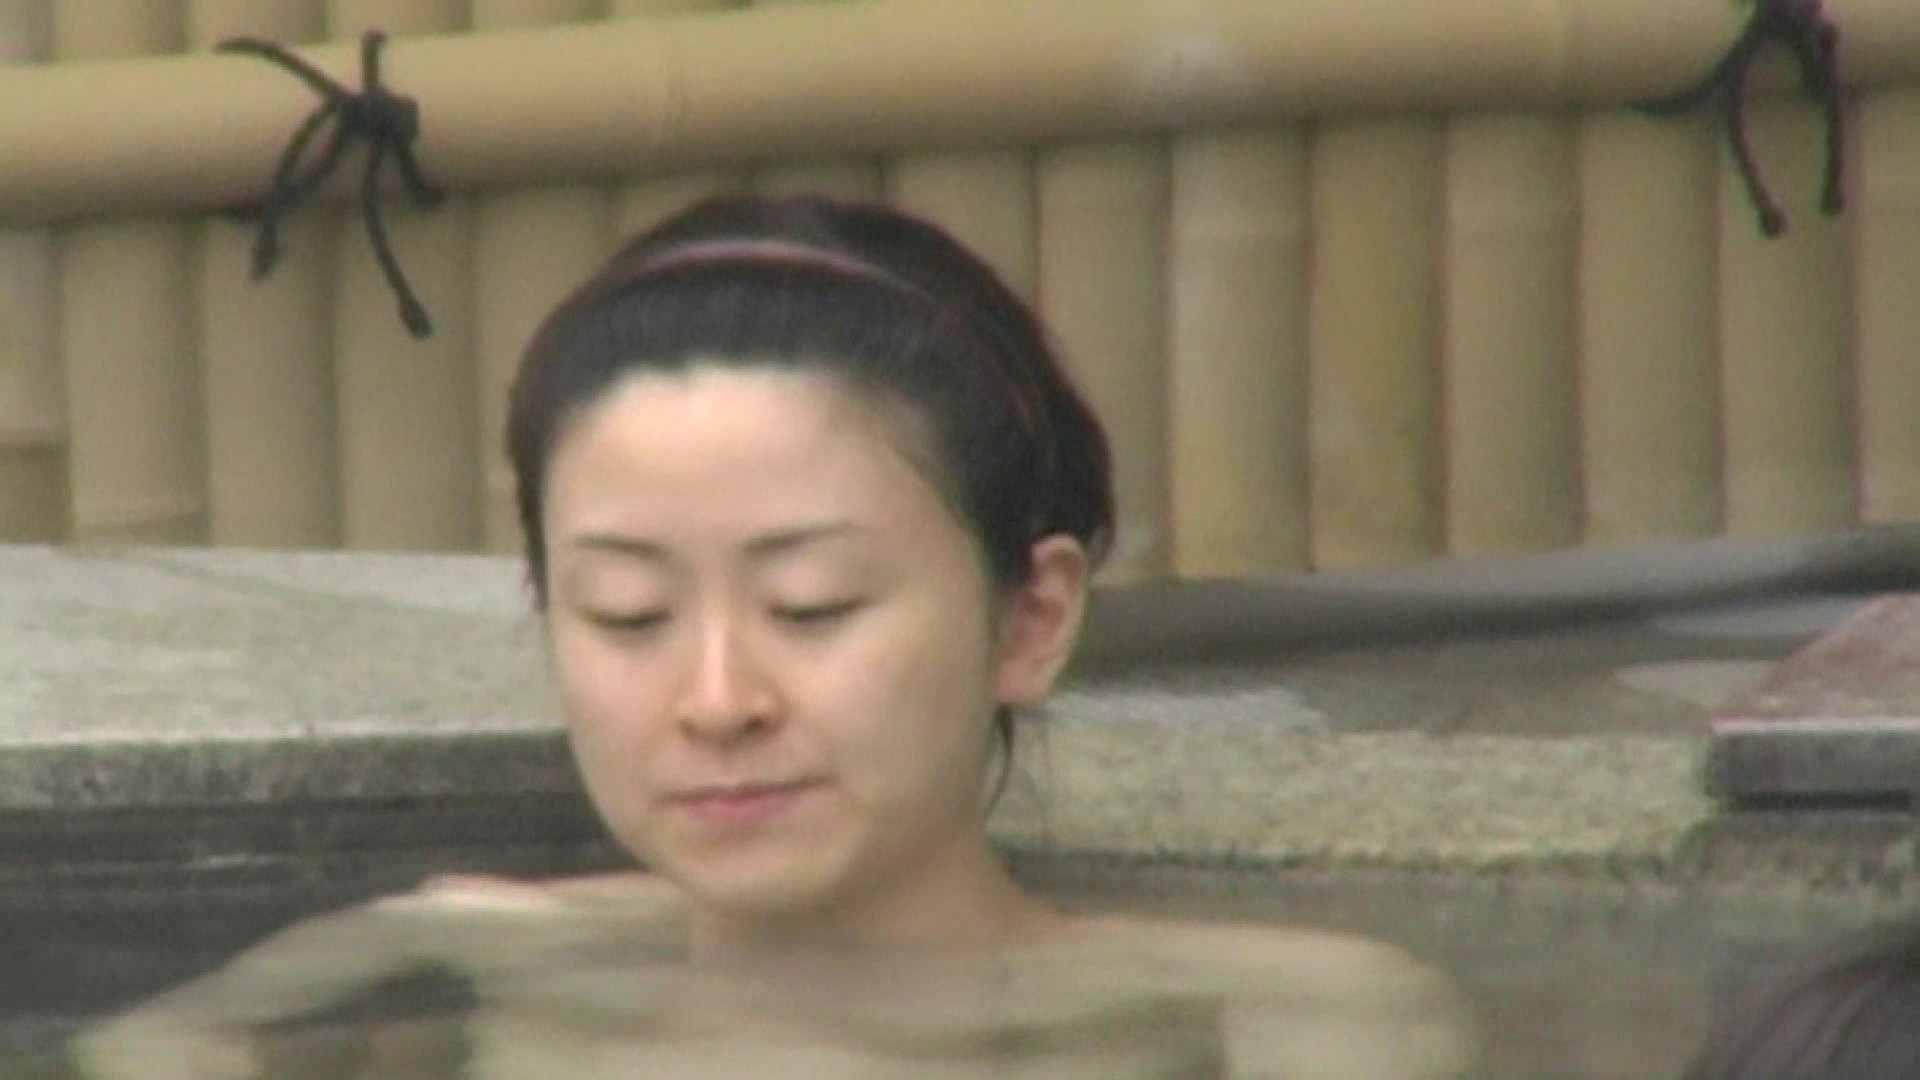 Aquaな露天風呂Vol.548 OLセックス のぞきエロ無料画像 103画像 26